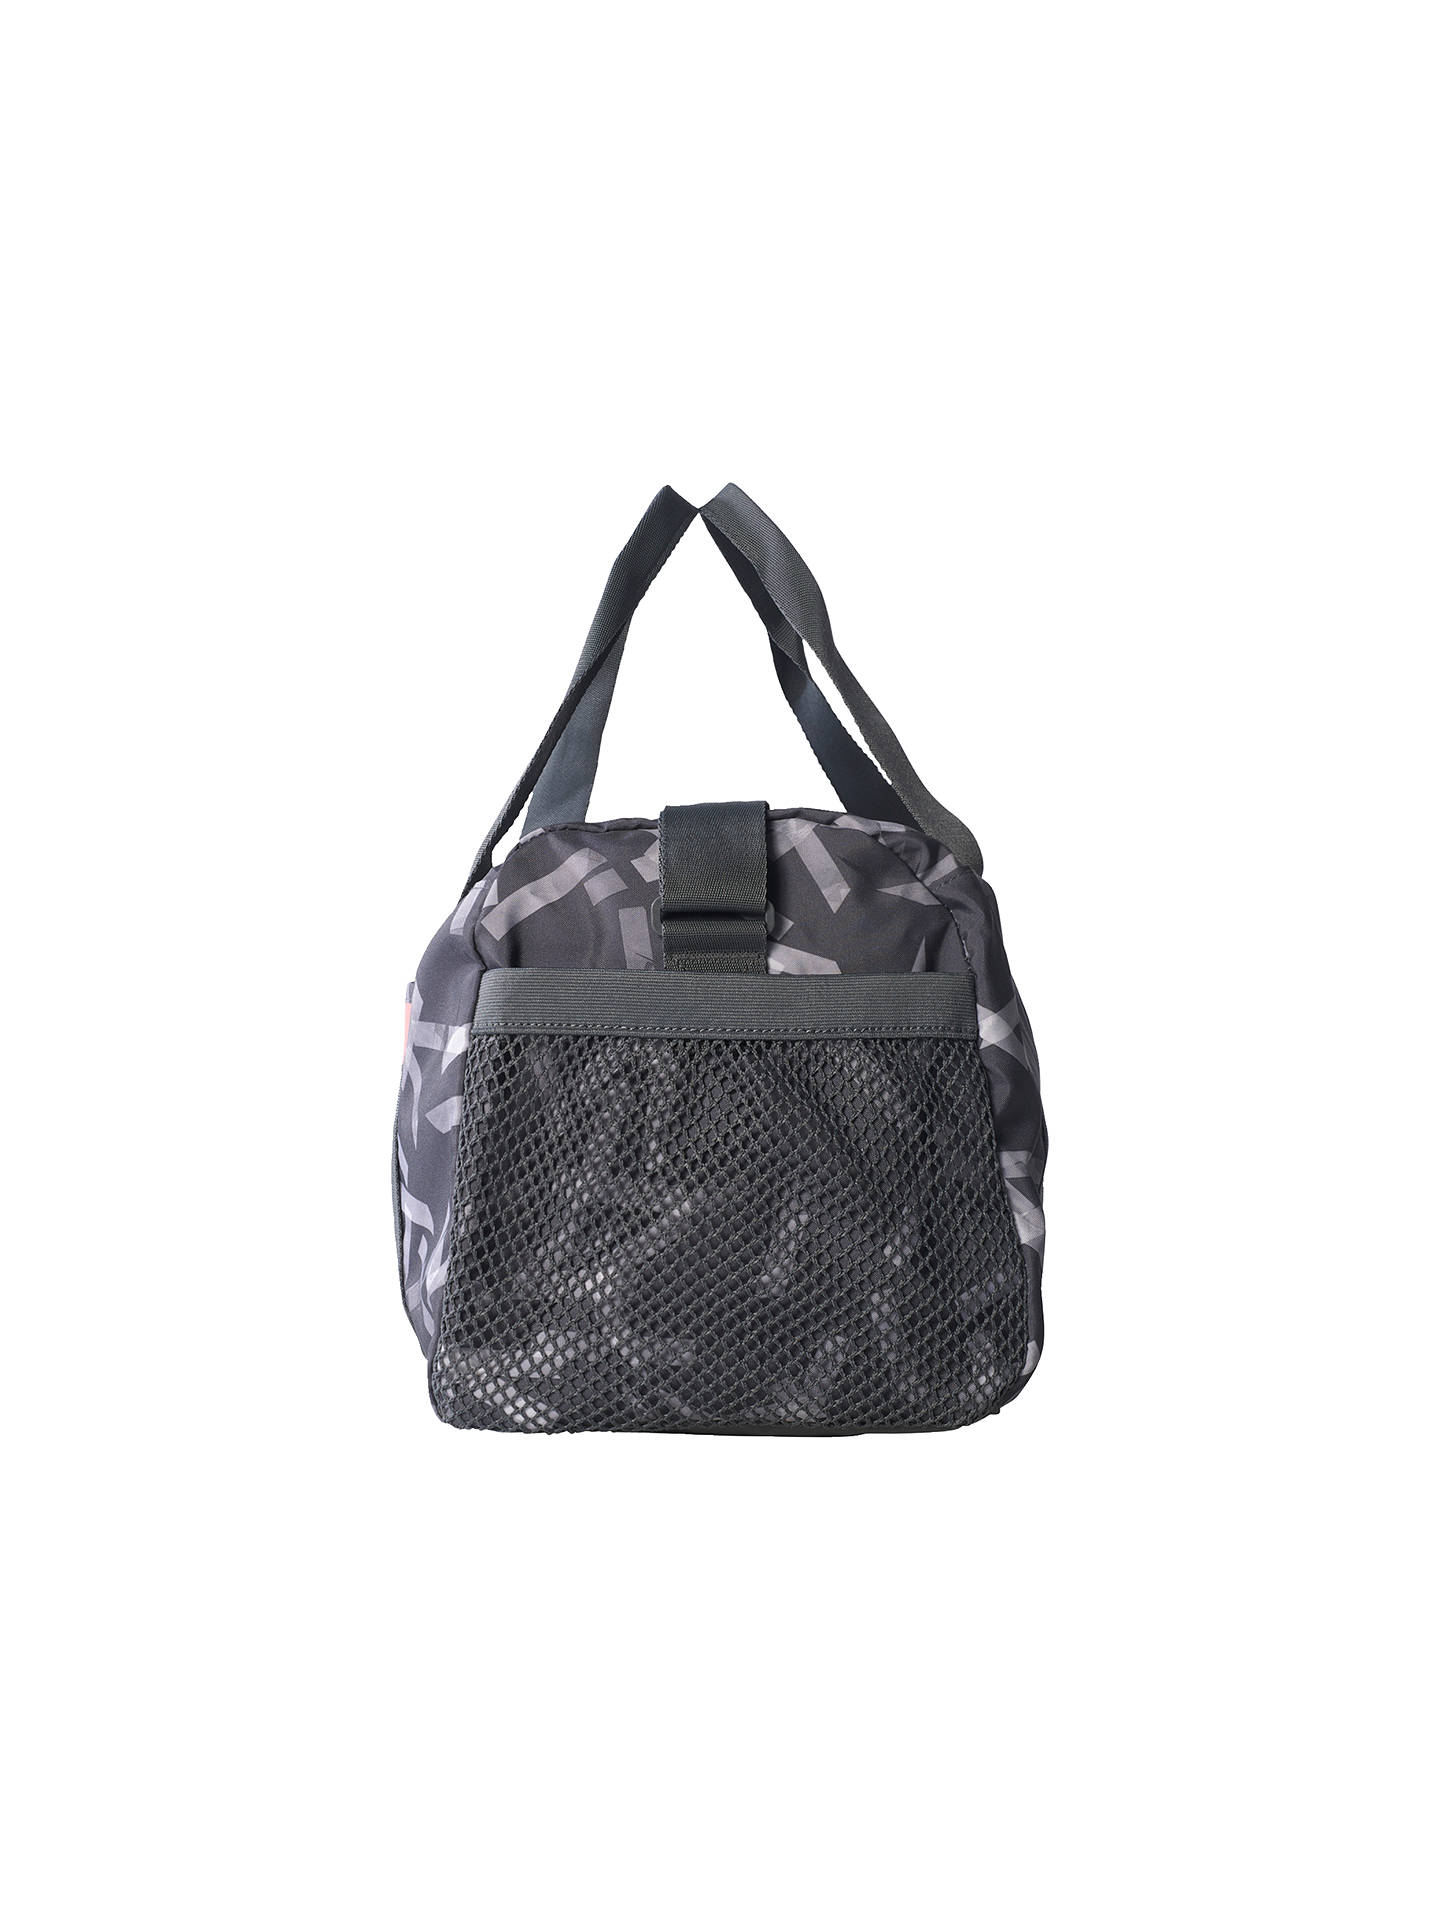 886c364b71 ... Buy adidas Good Graphic Team Bag